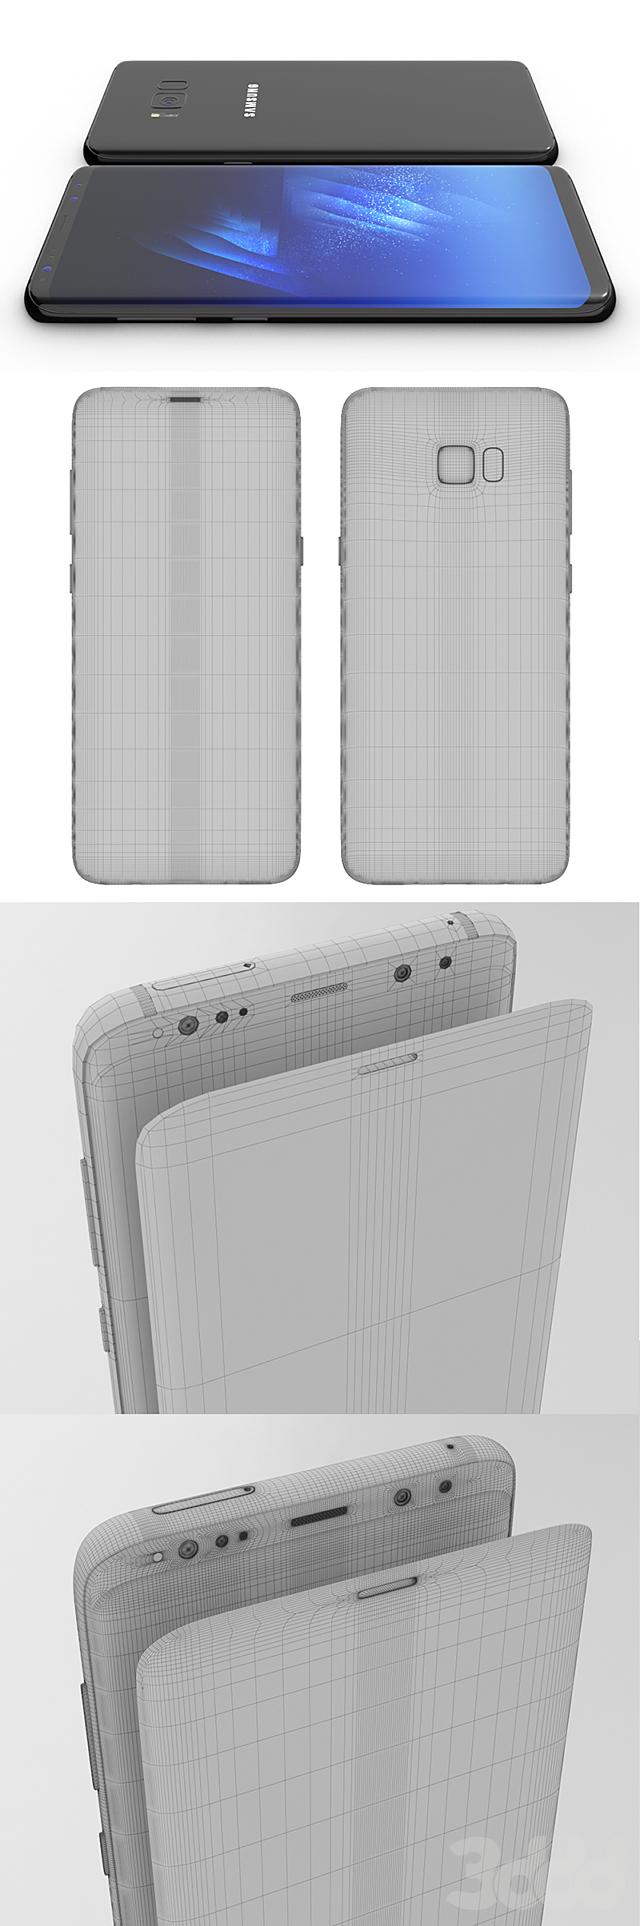 Samsung Galaxy S8 PLUS Midnight Black model